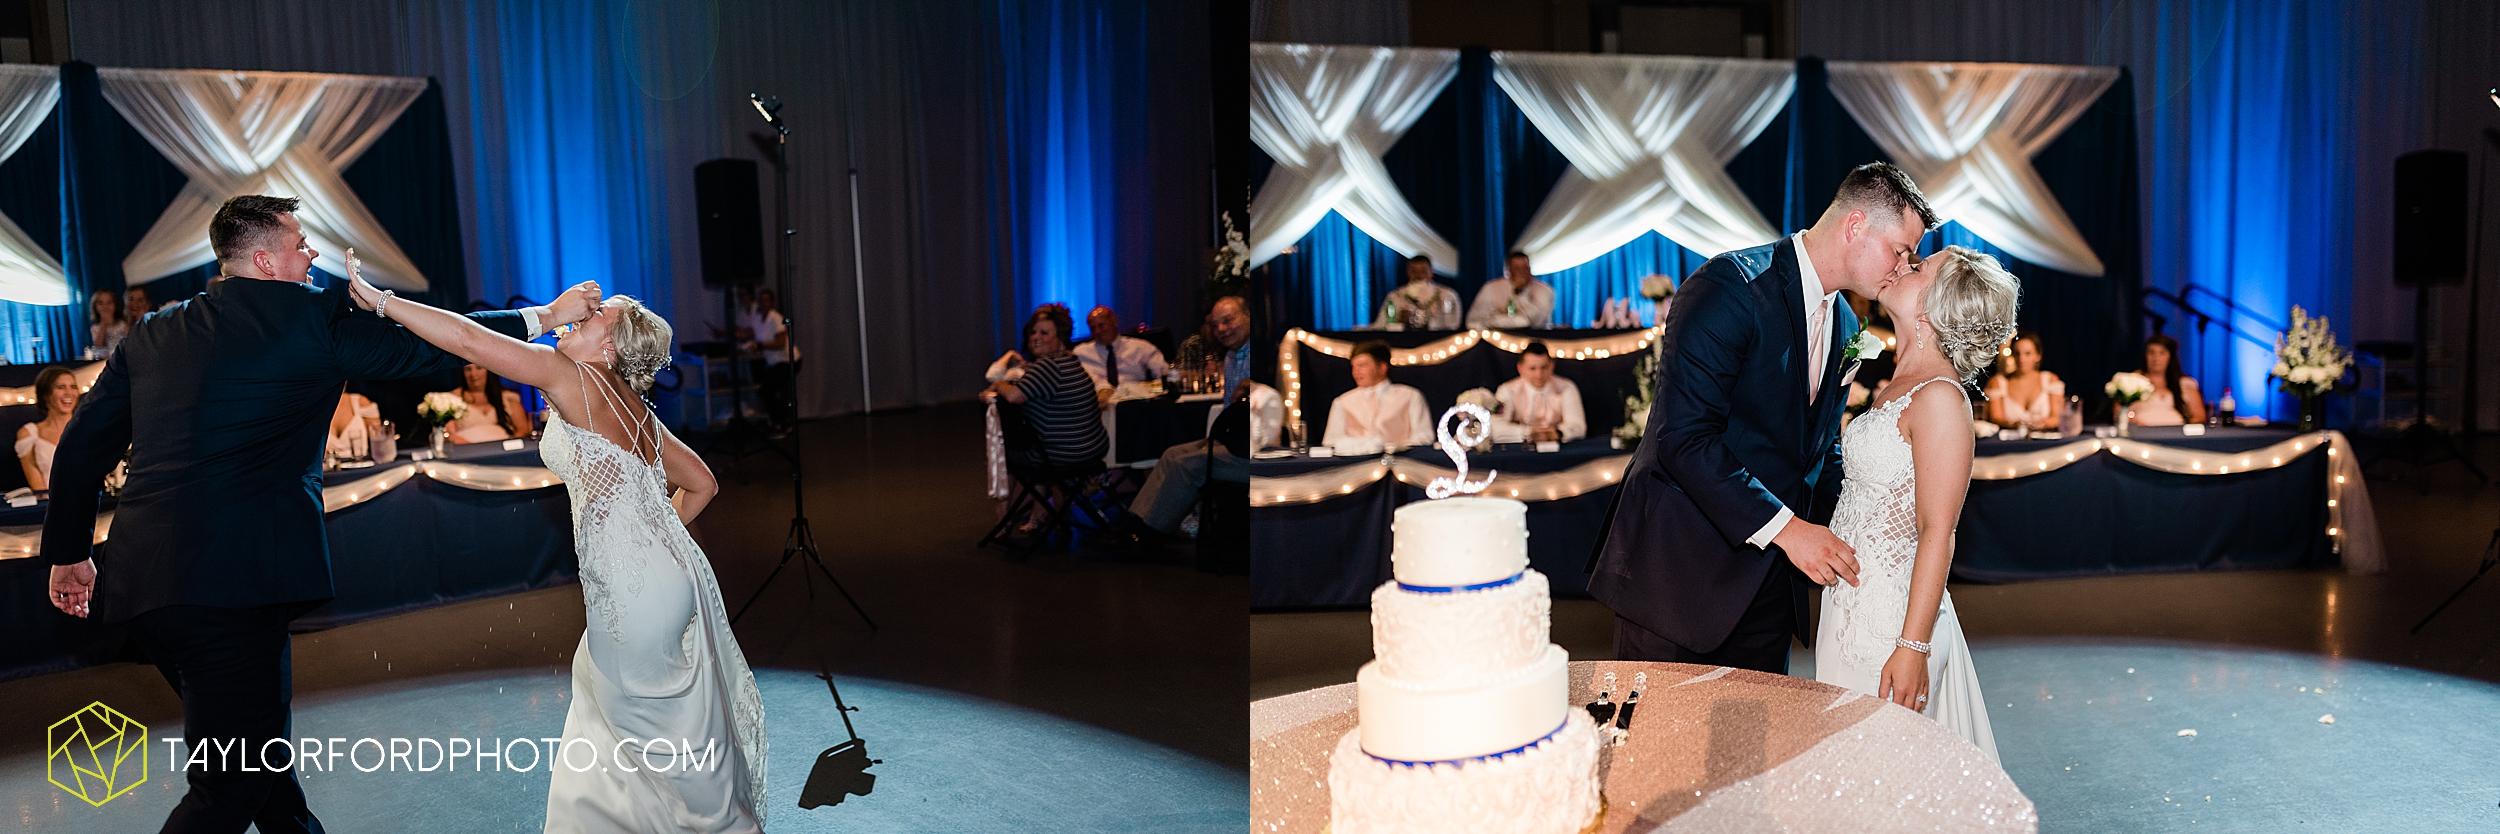 carly-trent-lima-elida-ohio-wedding-the-met-civic-center-reception-immanuel-united-methodist-church-photography-taylor-ford-hirschy-photographer_3377.jpg